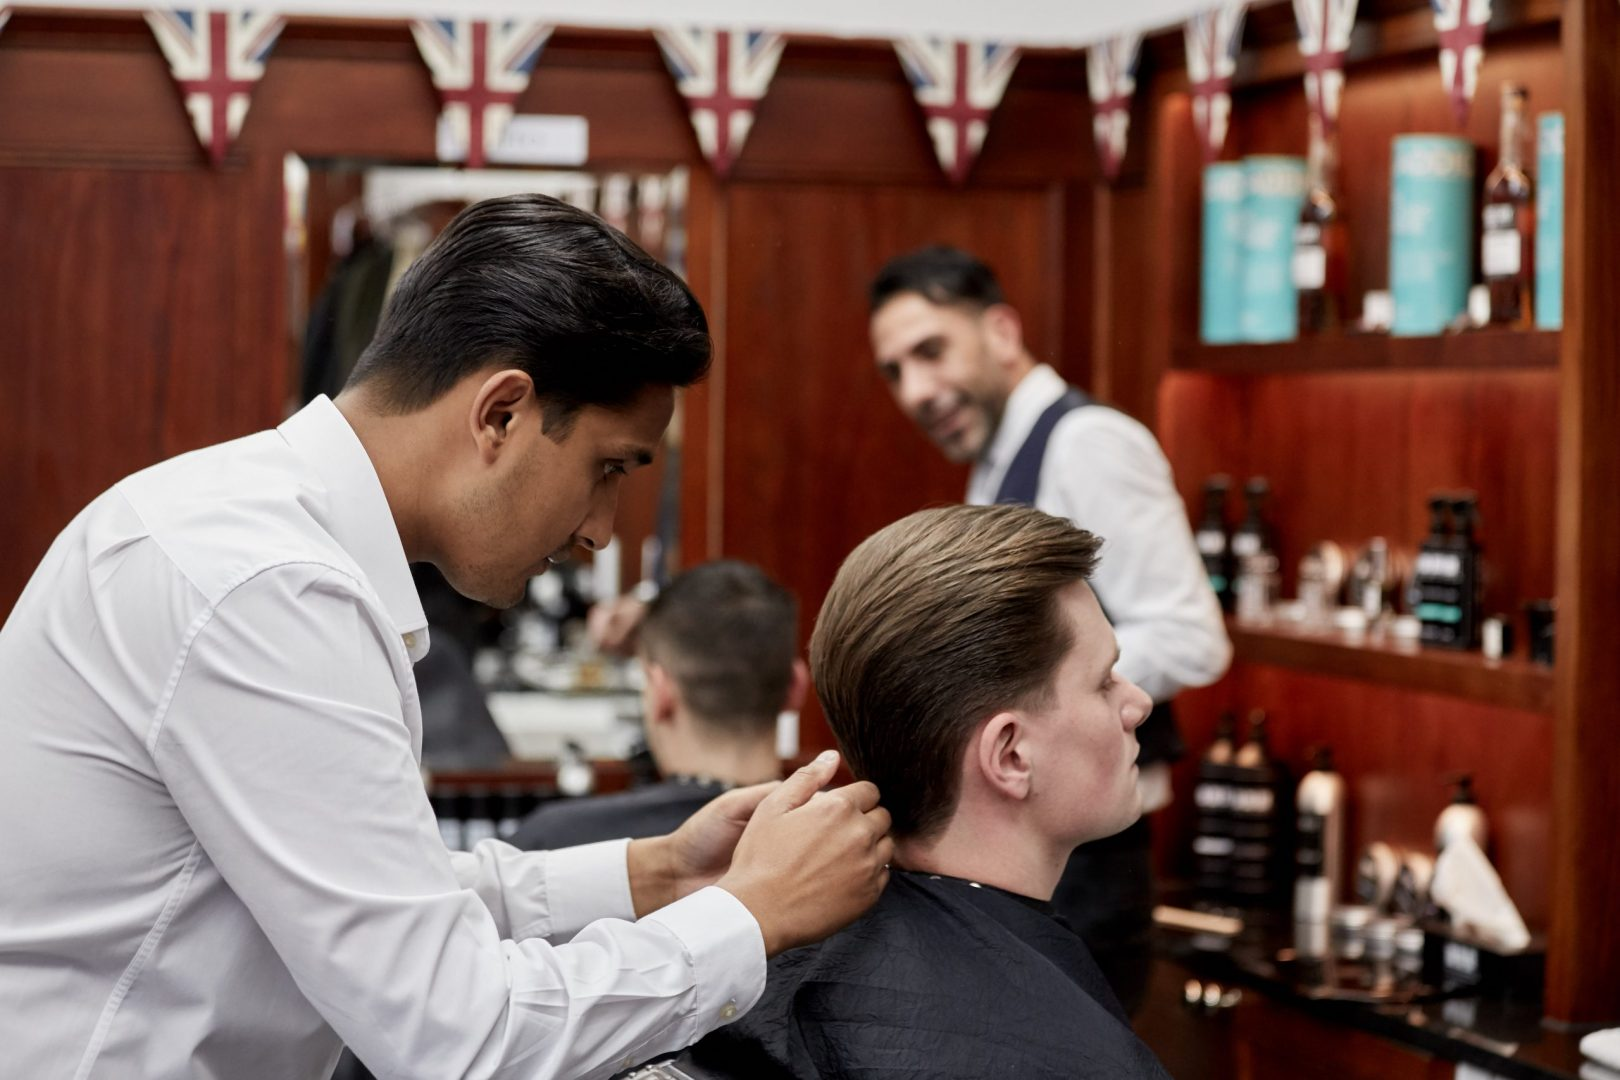 2020 Gentlemen Haircuts | The Gentlemen | London Barbers | Hair Style Advice | Pall Mall Barbers | Best Barbers London | 2020 Gentlemen Haircuts